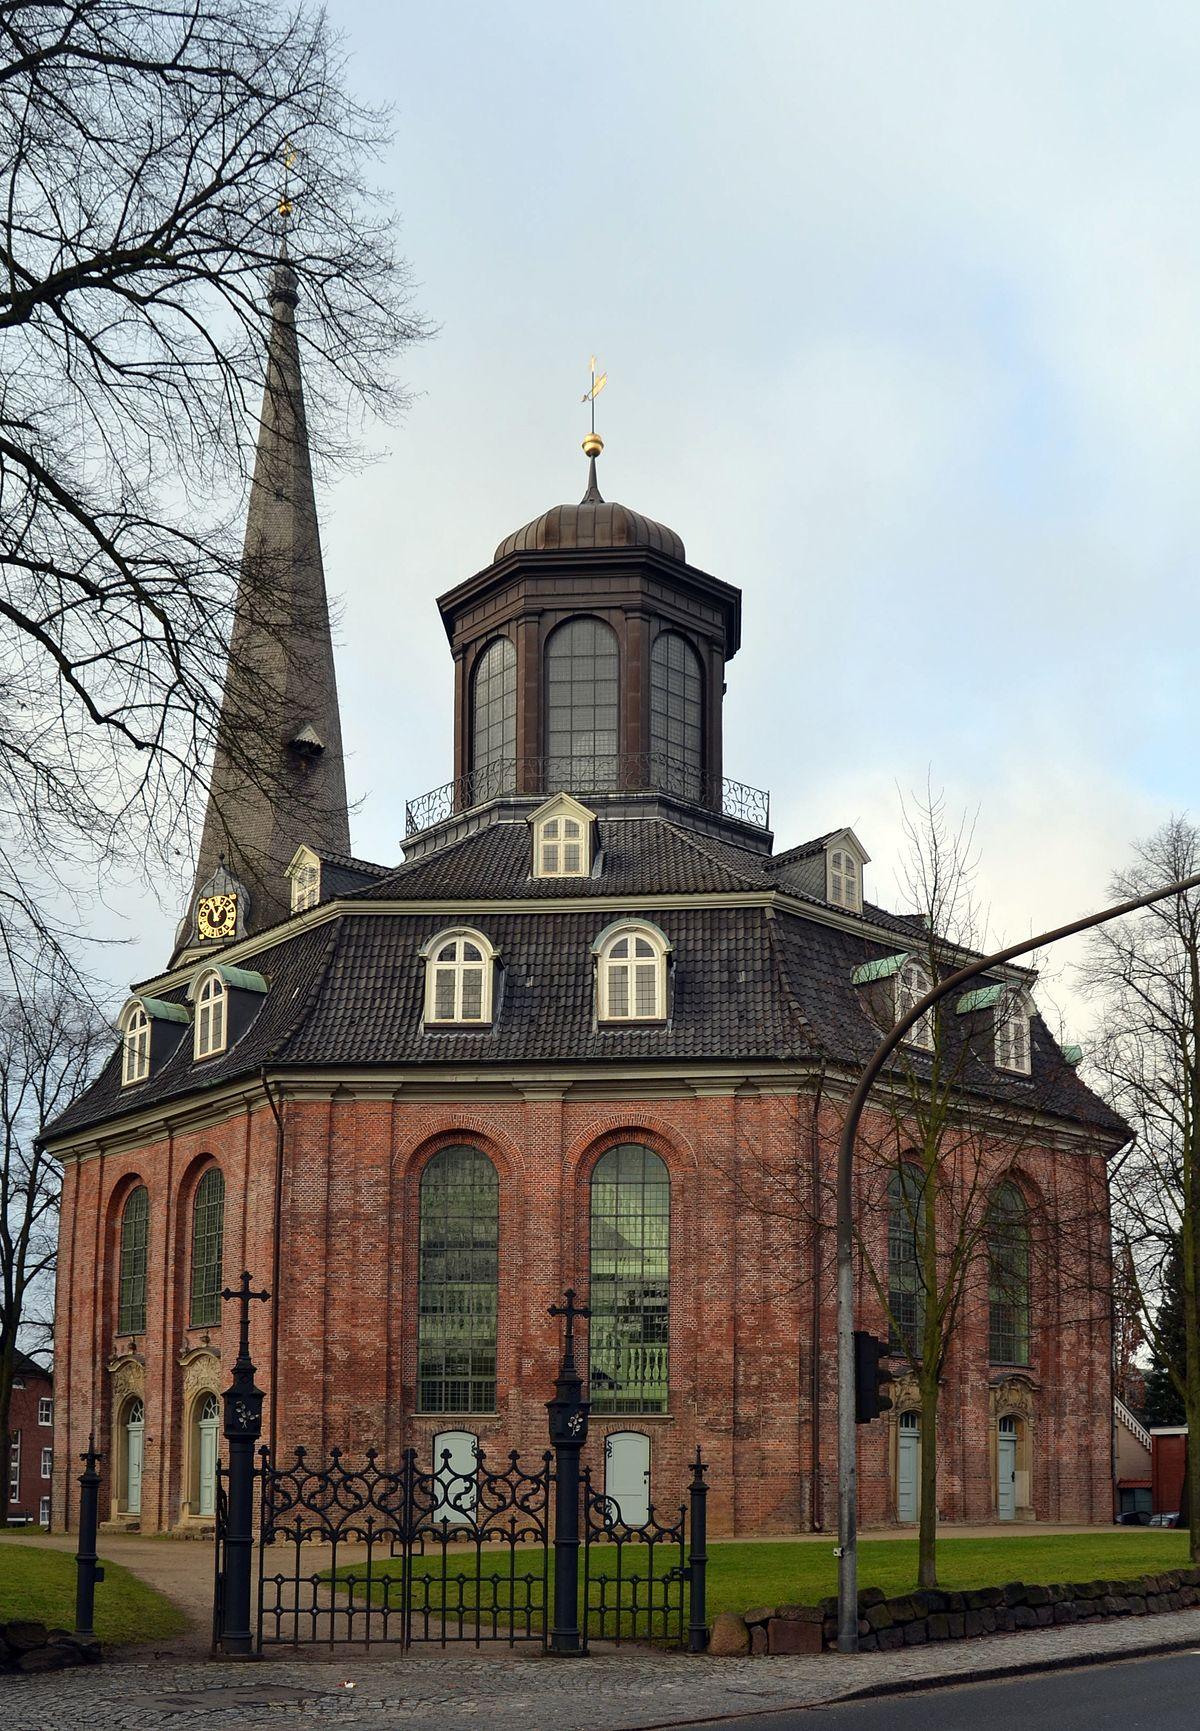 Octagonal Churches Wikimedia Commons